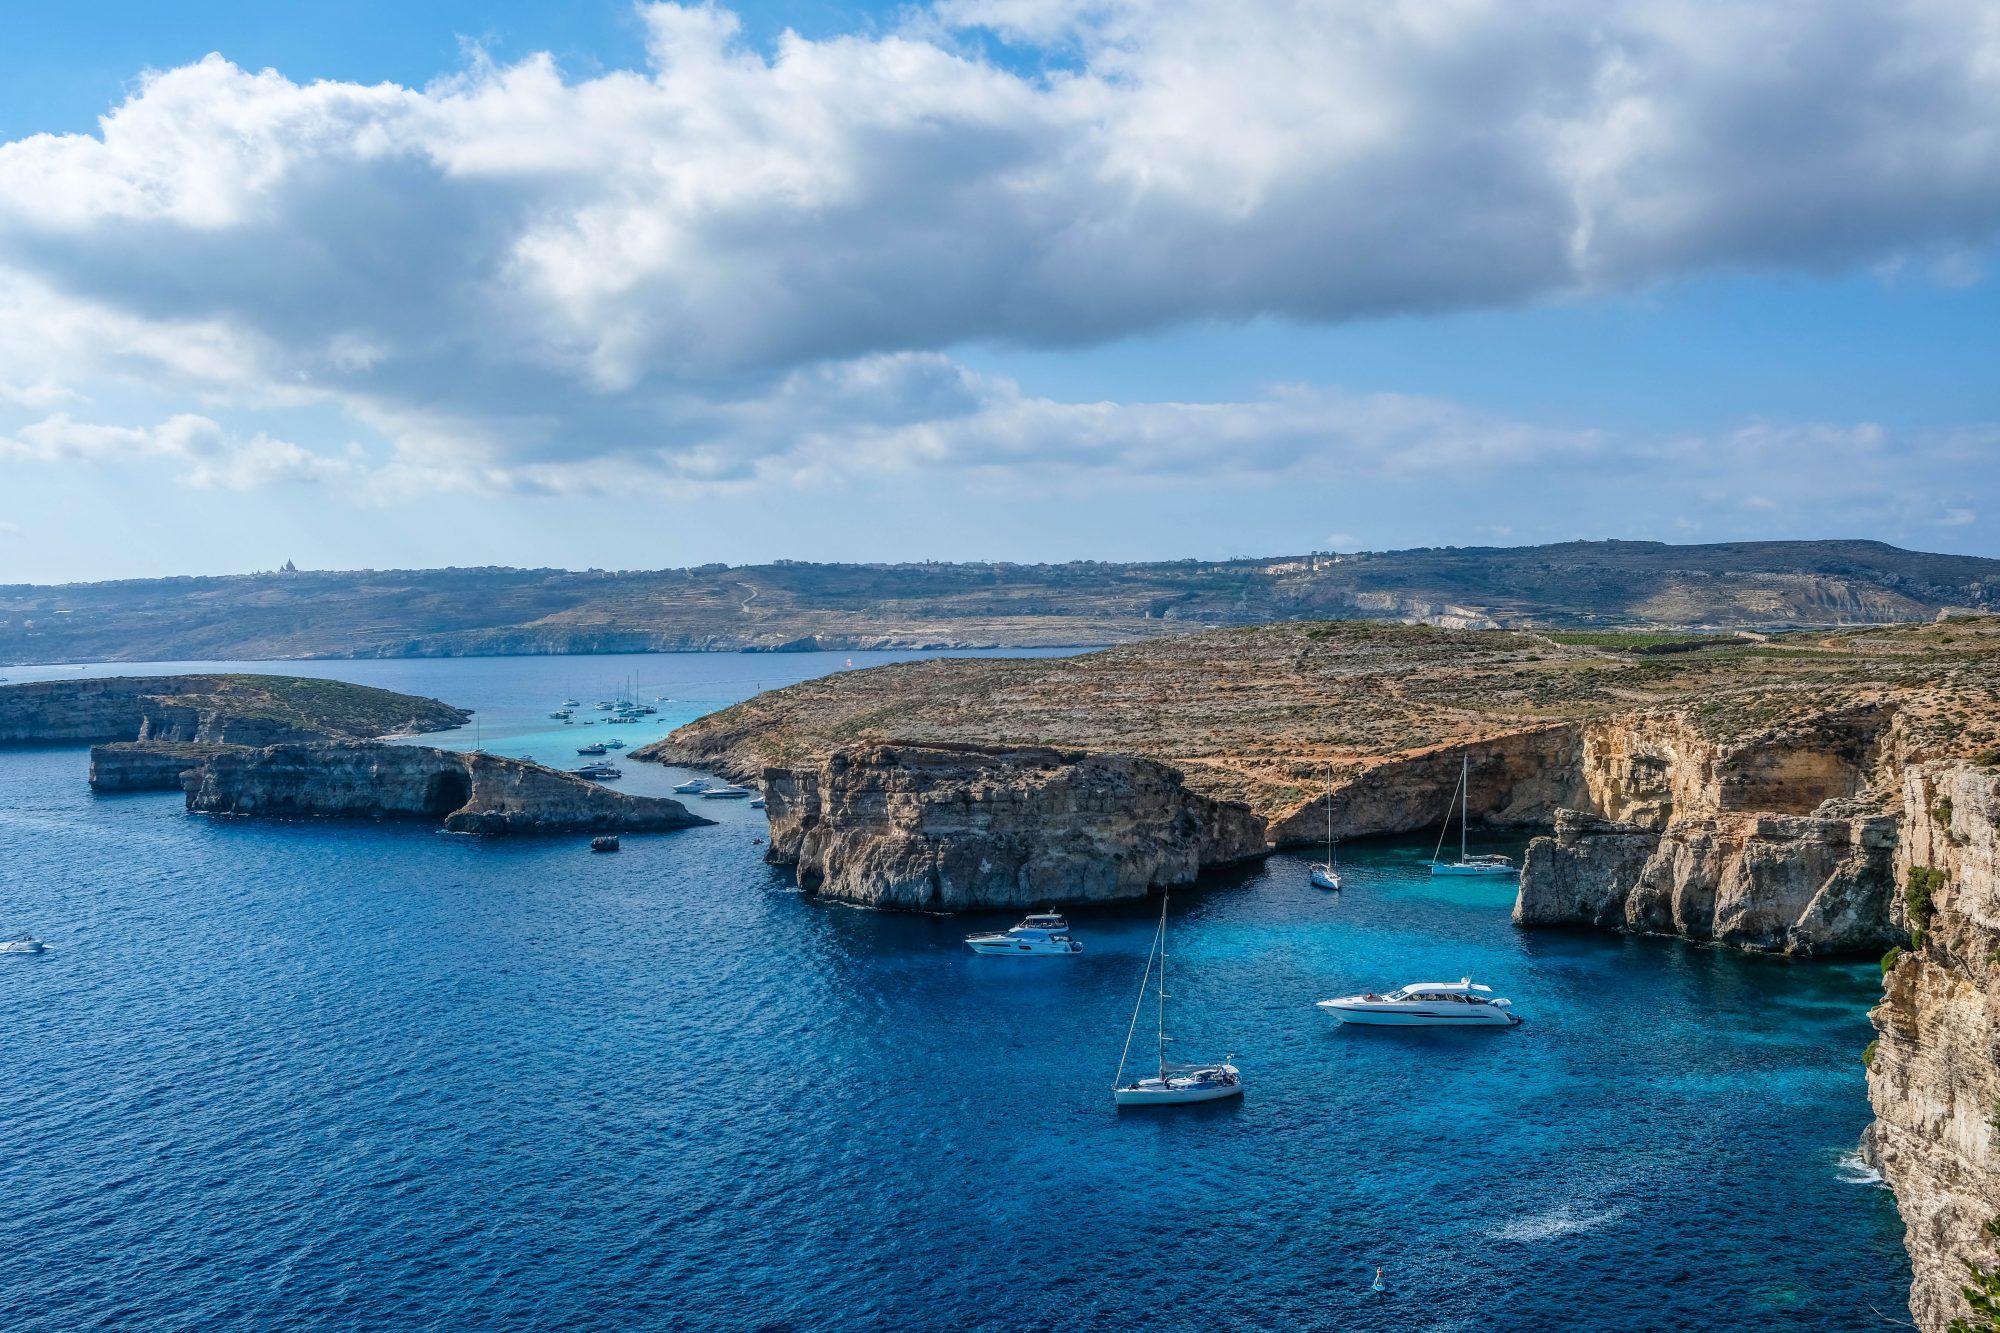 Blue Lagoon et Gozo en fond